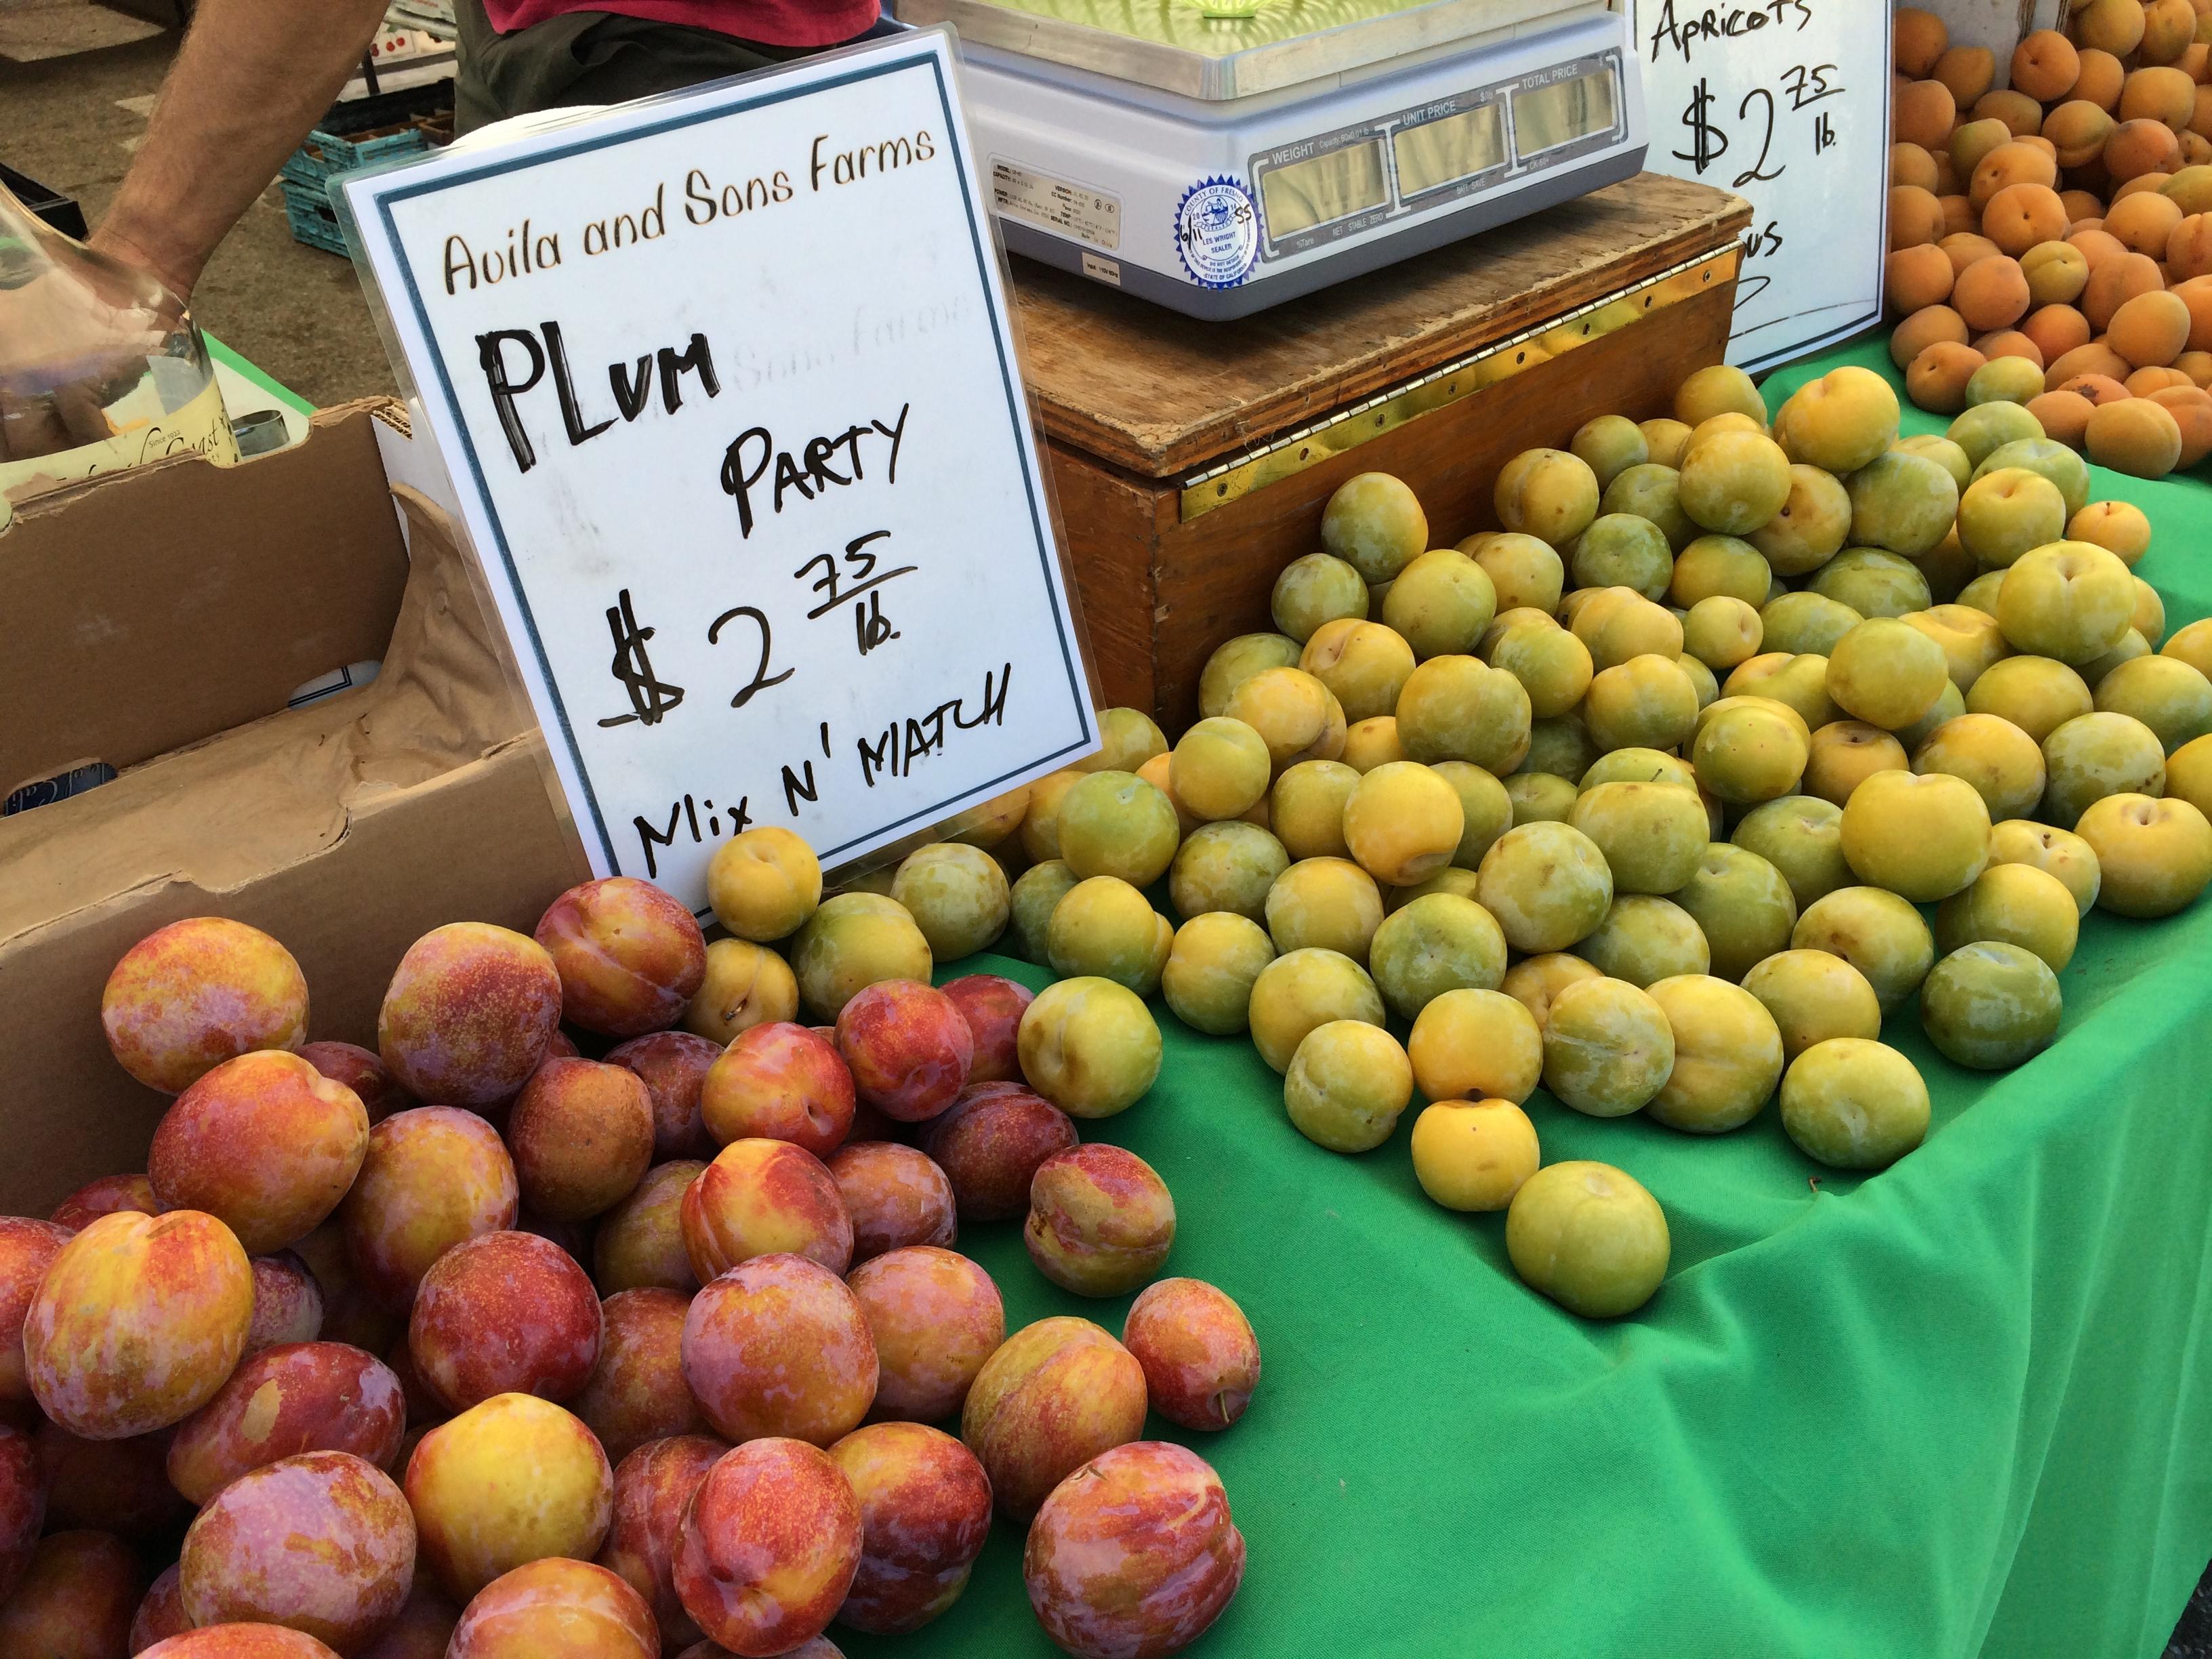 Plum party at Santa Monica farmer's market